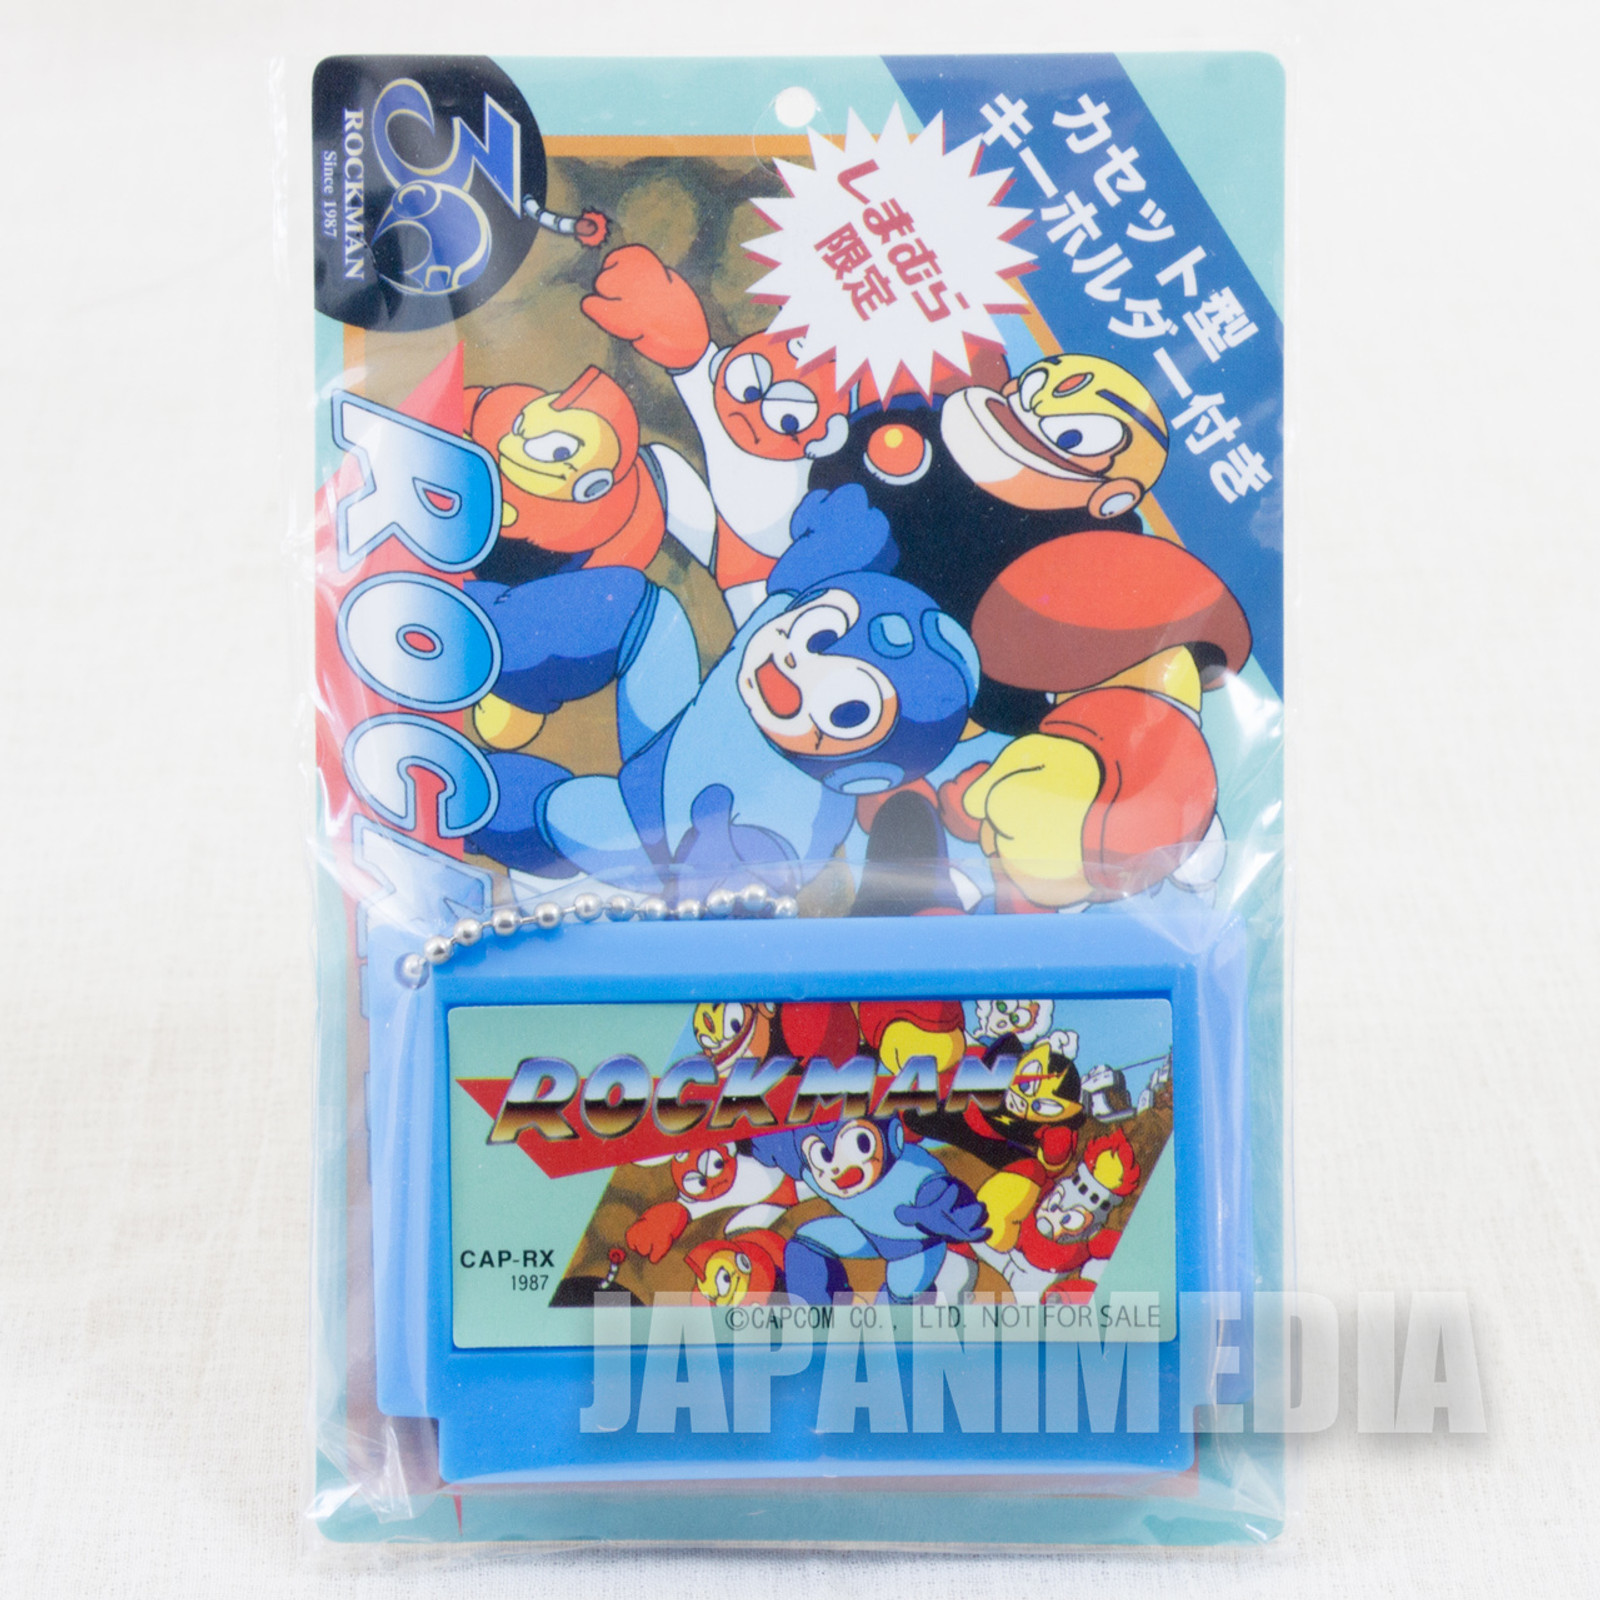 Rockman Mega man Famicom Cassette Type Miniature Figure Ballchain Capcom JAPAN NES